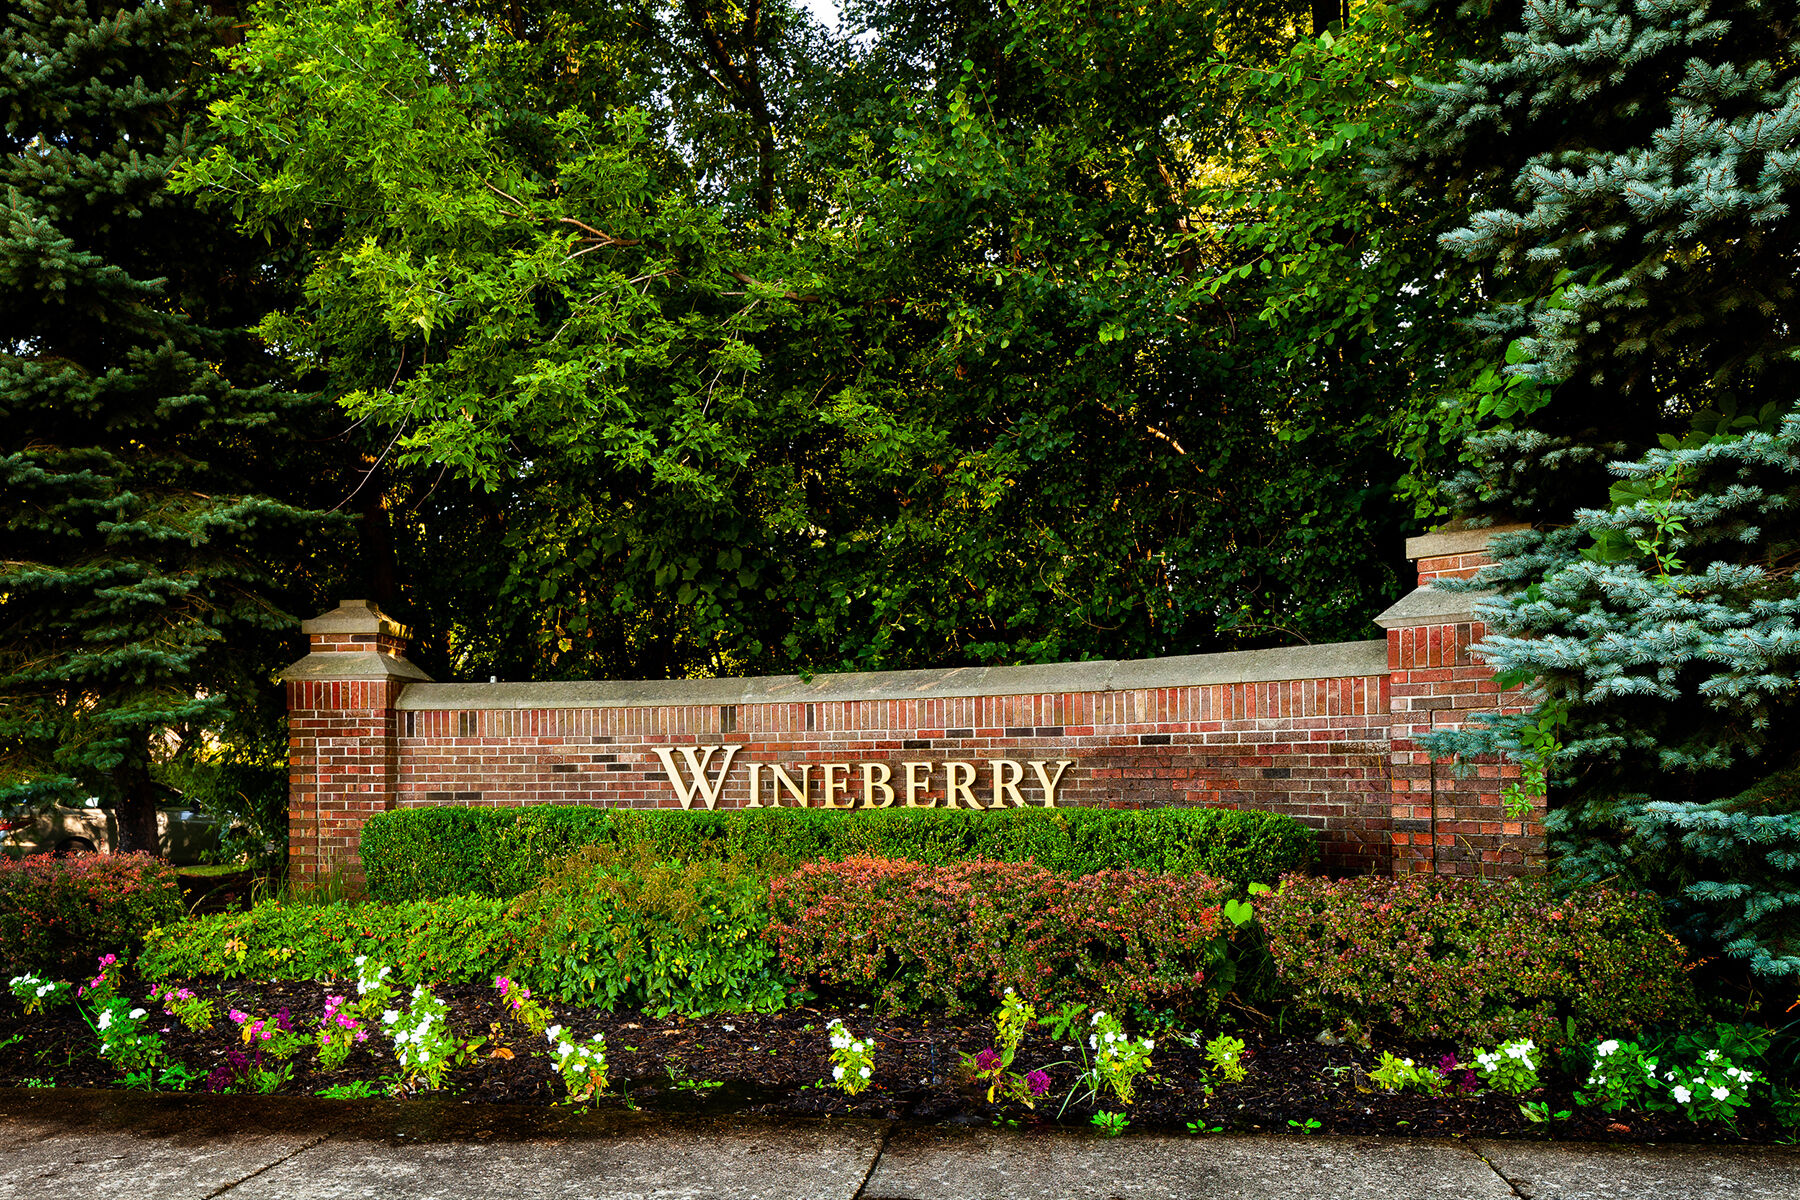 Wineberry Entrance